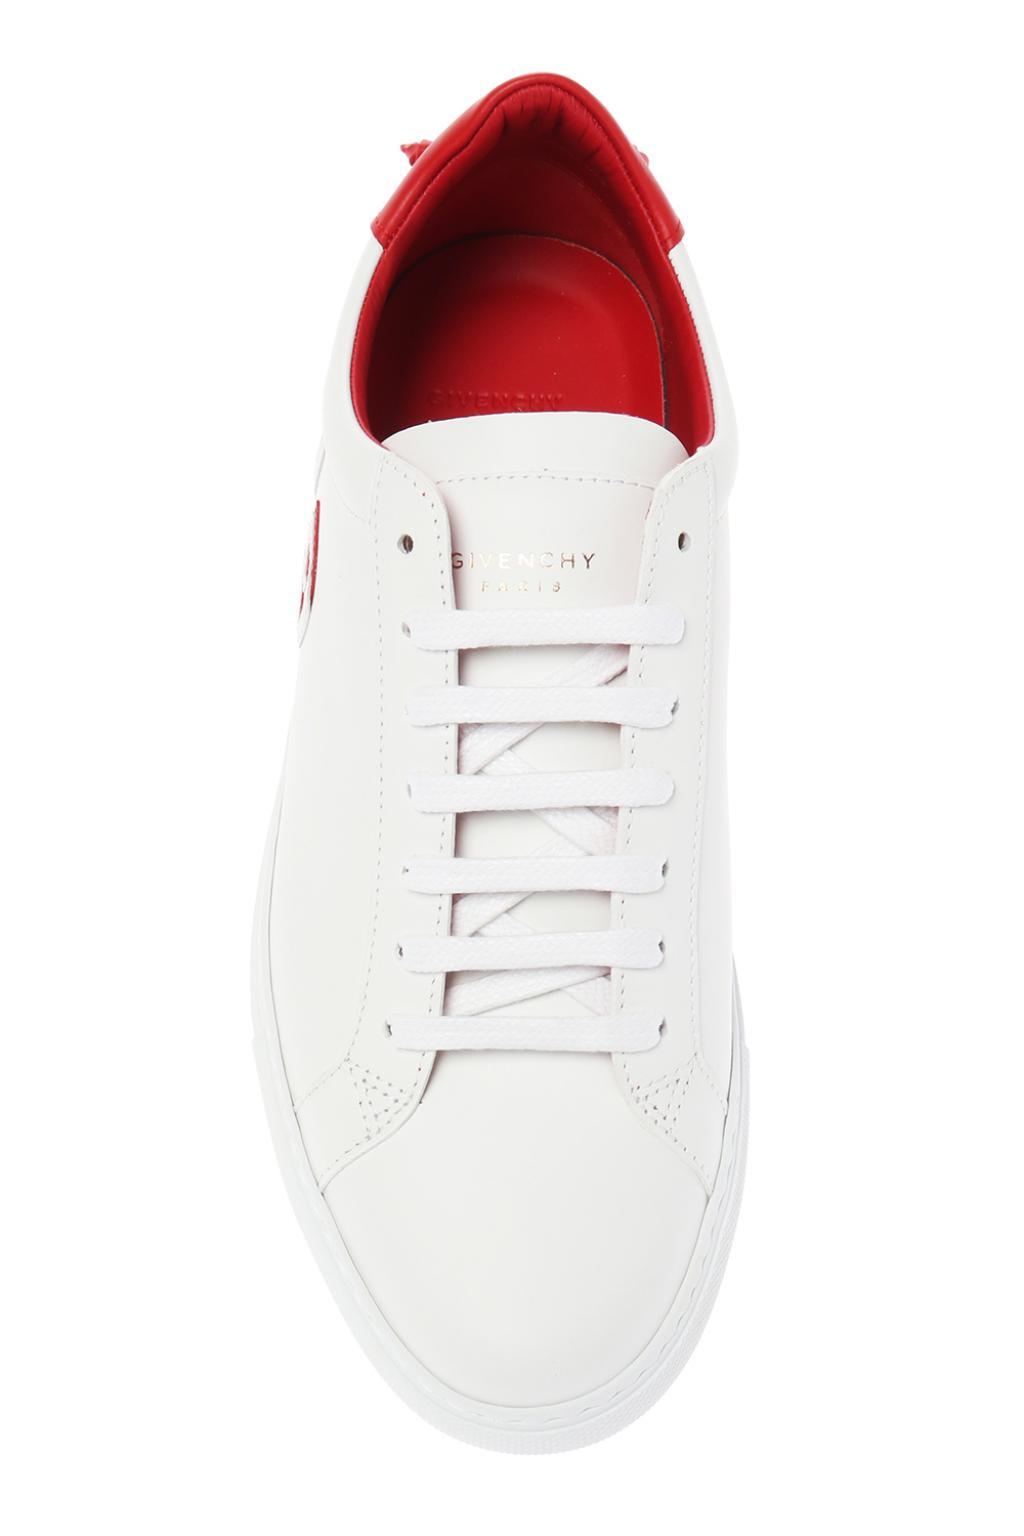 Givenchy 'Urban Street' logo sneakers